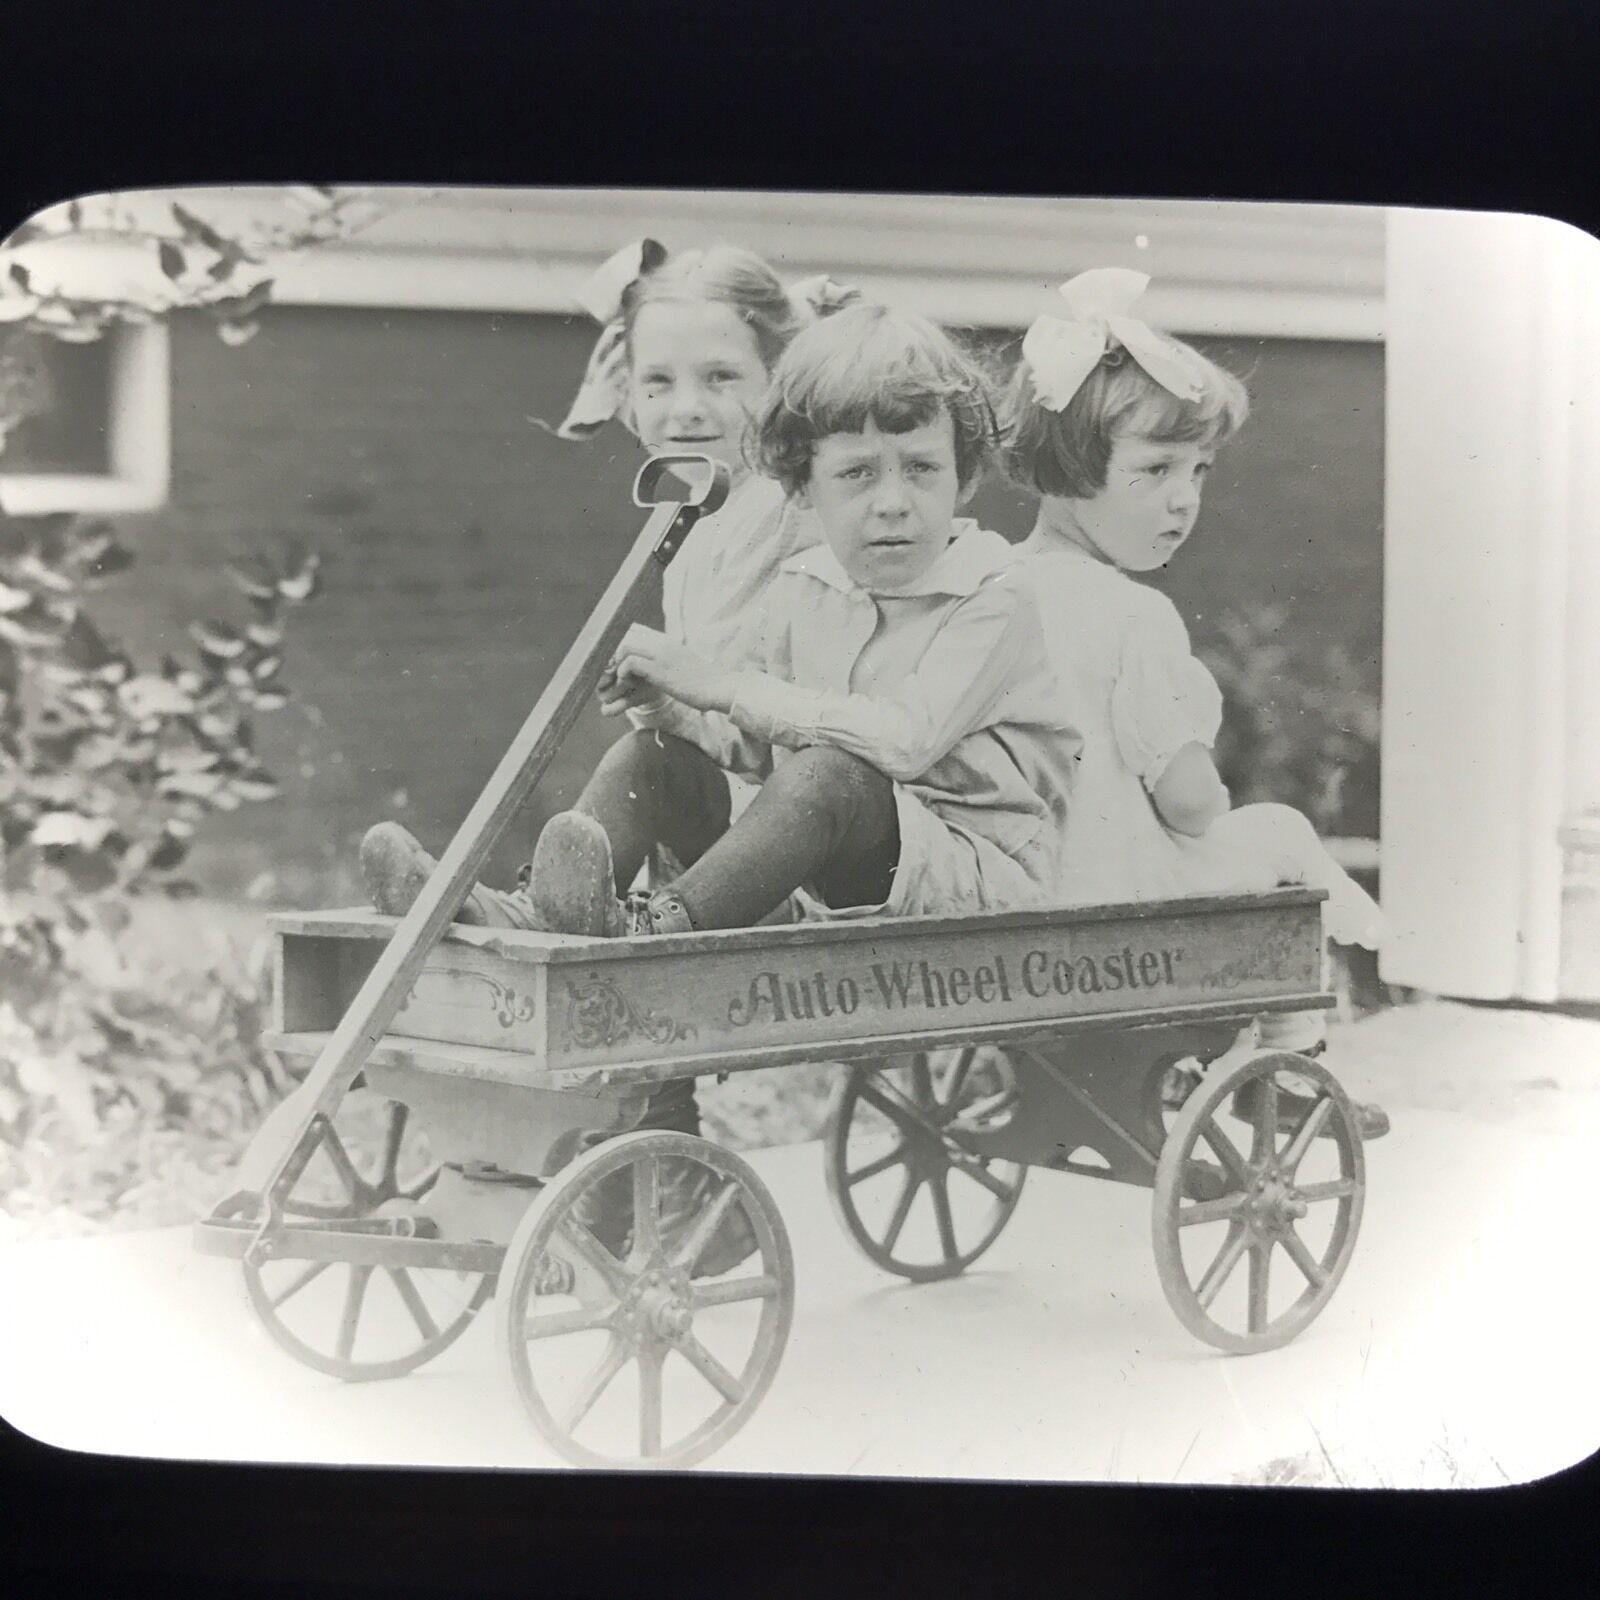 Girls in Auto-Wheel Coaster, magic lantern slide (c.1920).jpg